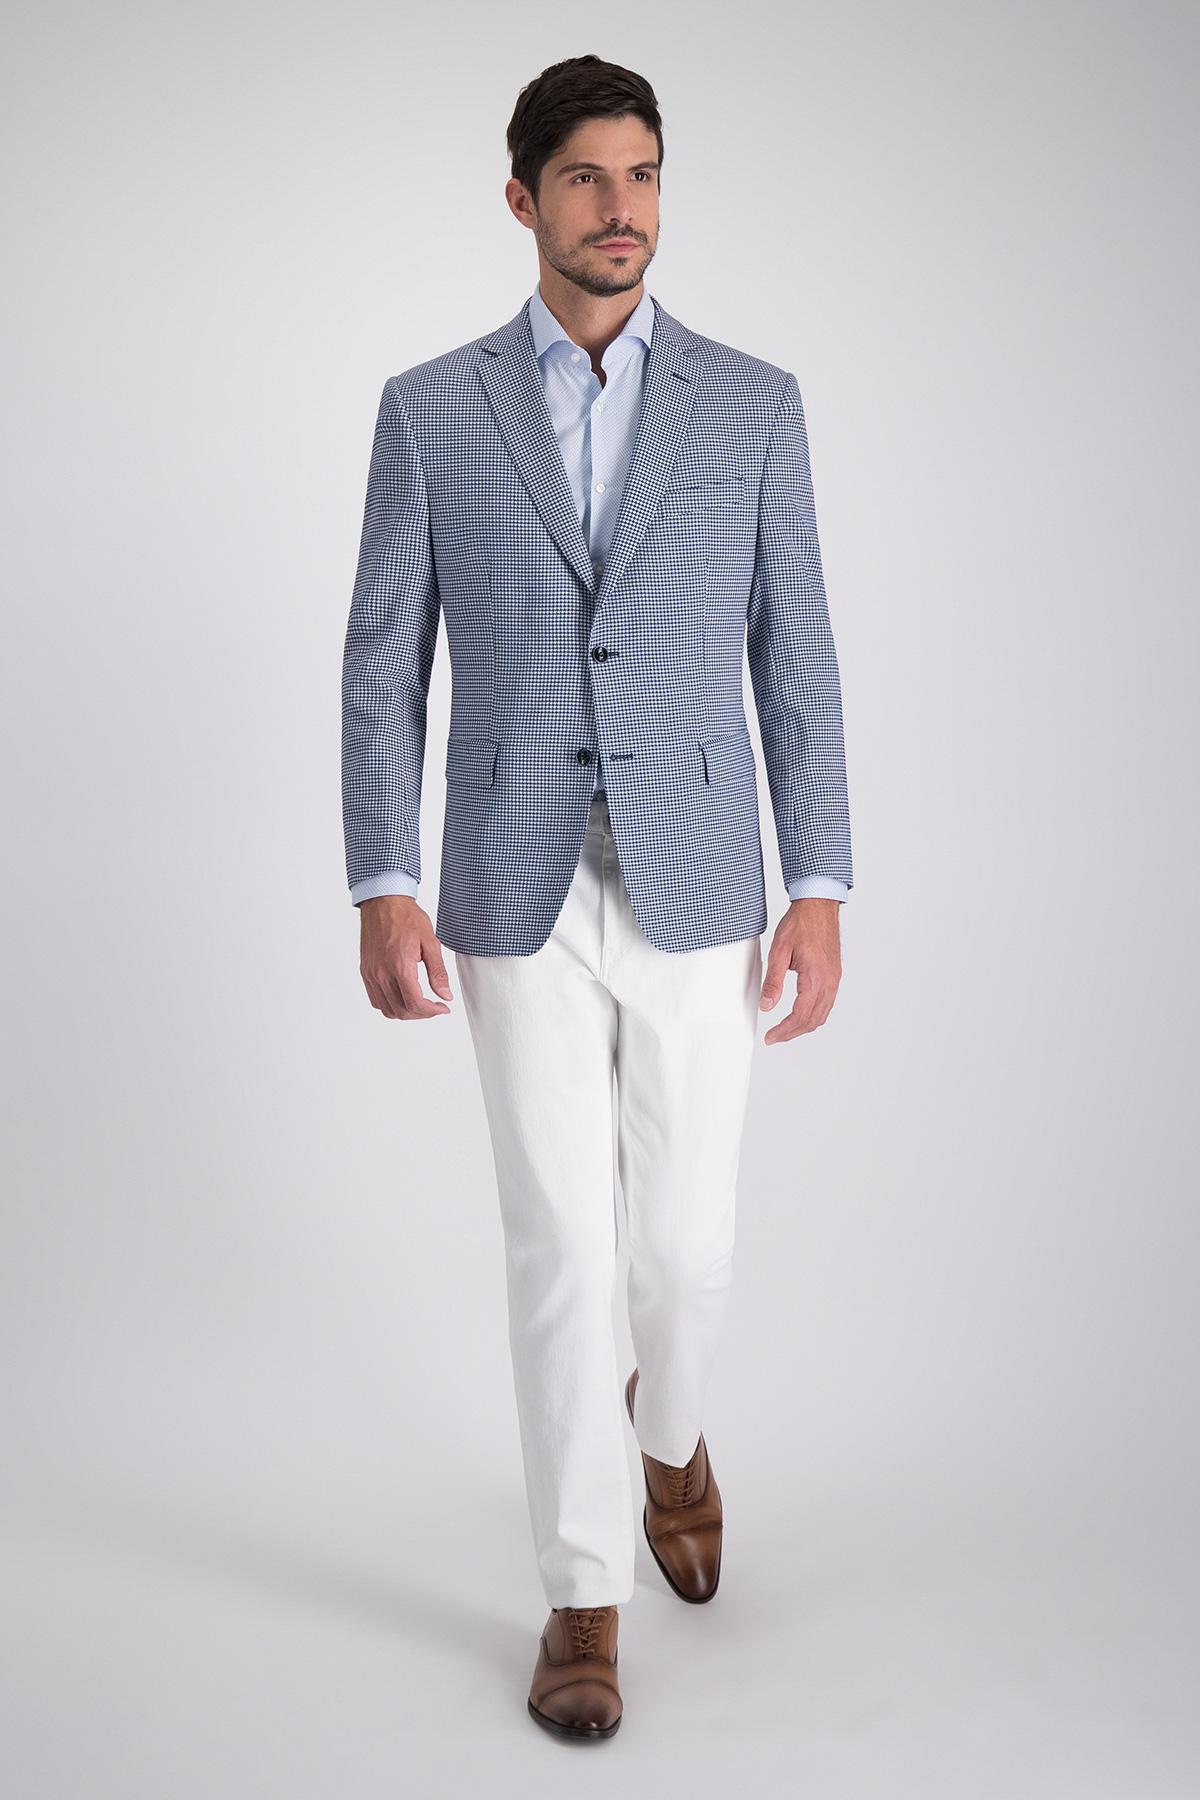 Saco de Marca Calderoni con tejido lana azul pied de poule